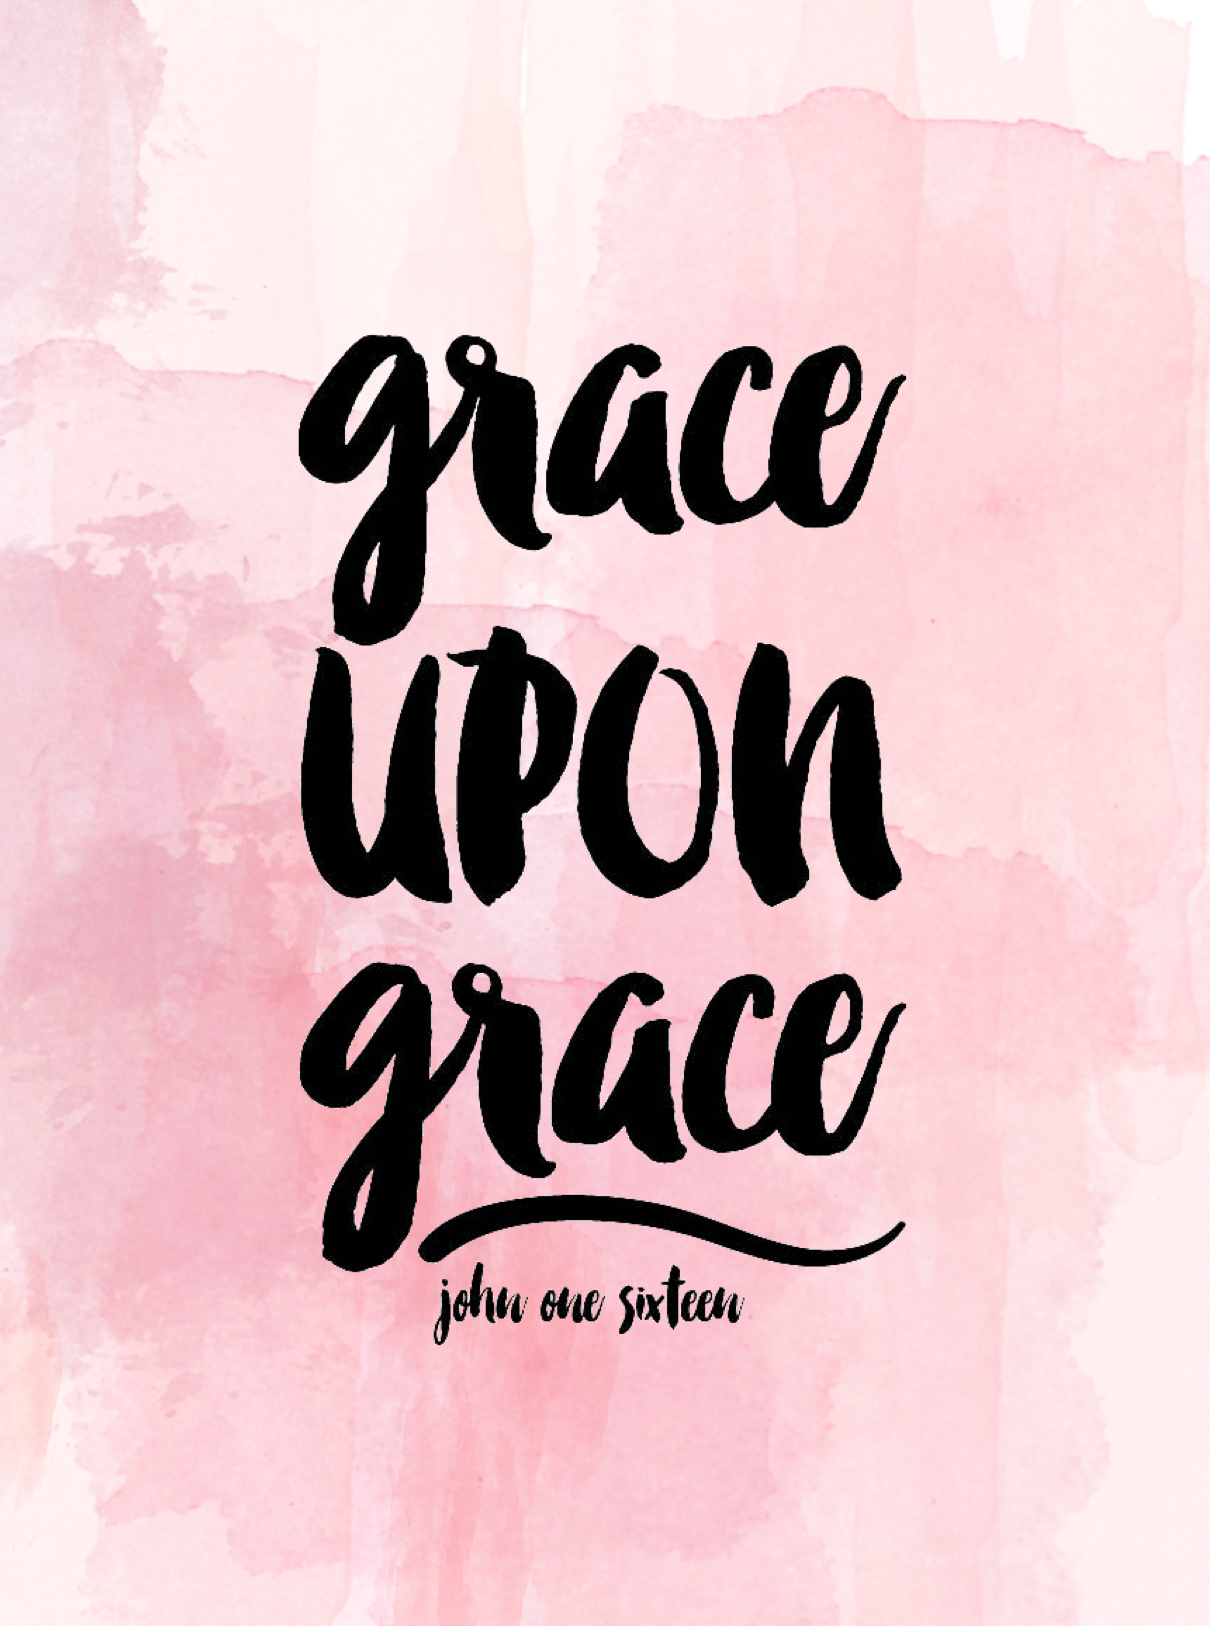 grace upon grace John 1:16 wallpaper   christian wallpaper, bible verse wallpaper, iPhone ...